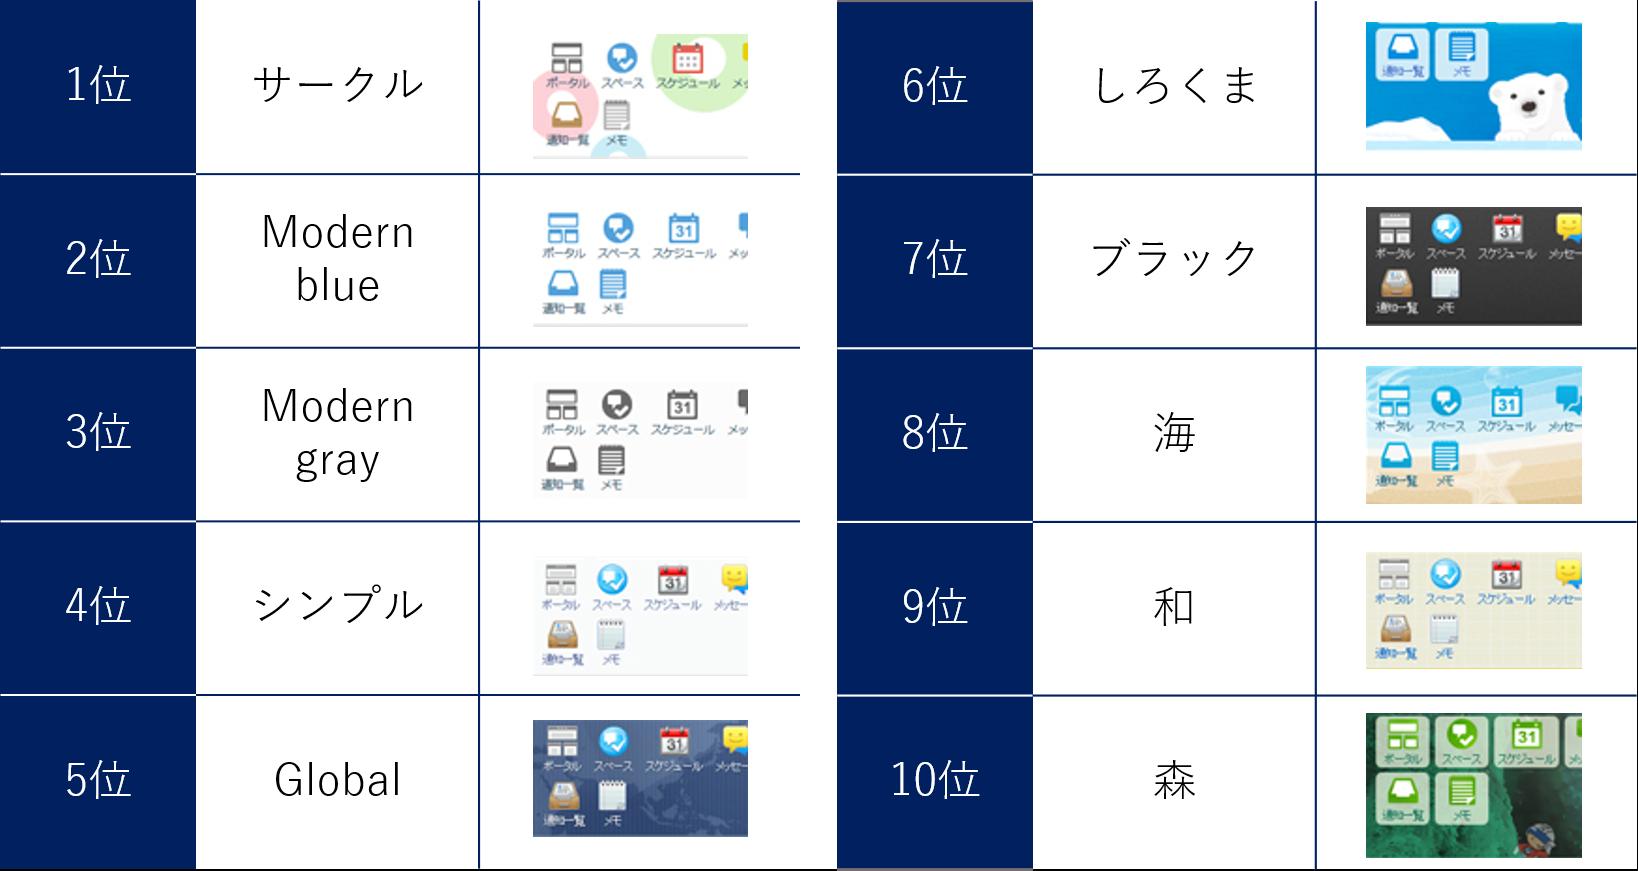 https://enterprise.cybozu.co.jp/feb748de1e9e482bd5725d7cc647cb7b1c8baf80.png